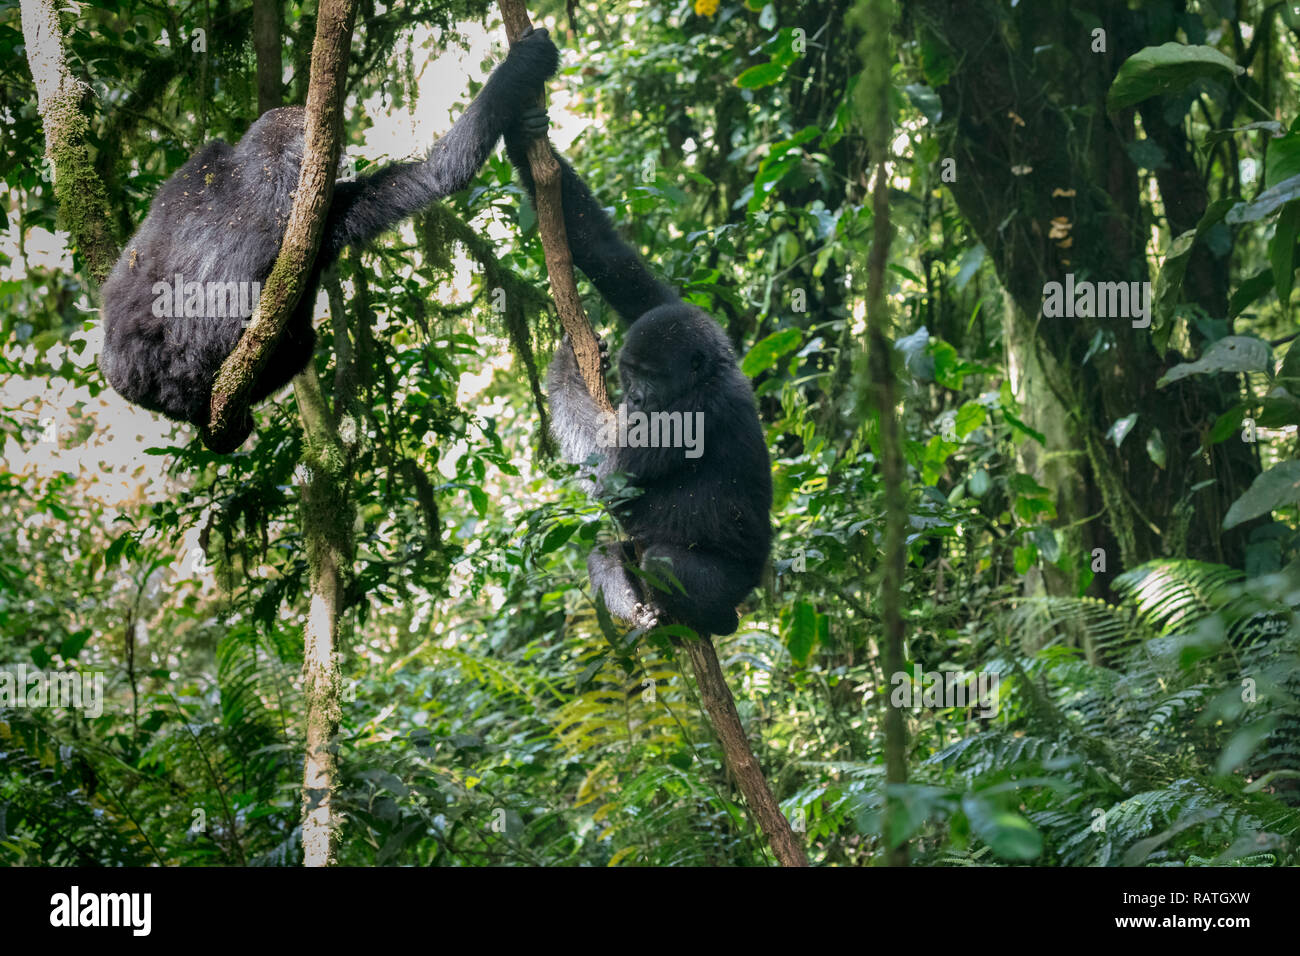 mountain gorillas descending from tall tree, Gorilla beringei beringei, Bwindi Impenetrable Forest National Park, Uganda - Stock Image